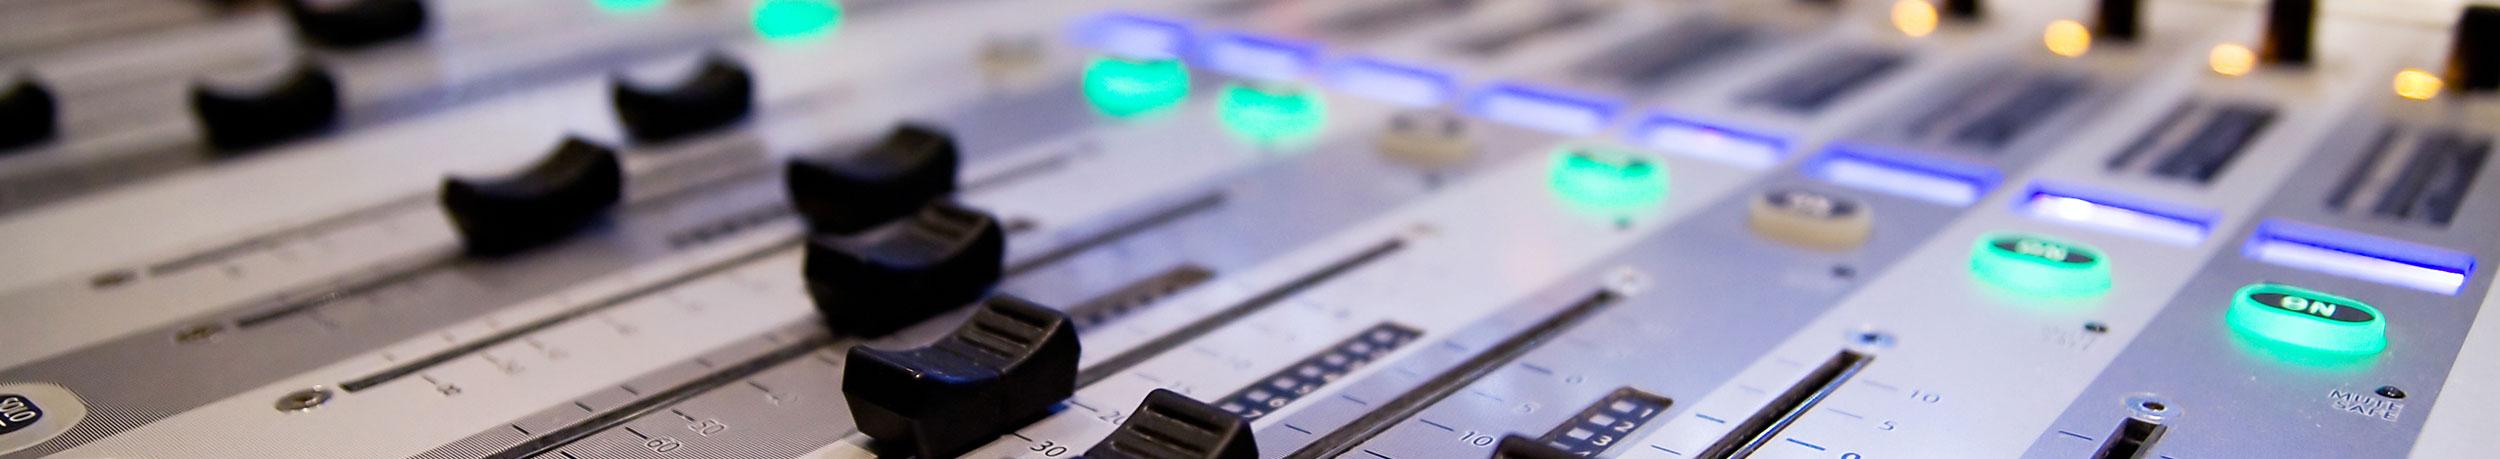 itvmedia-pagina-radio